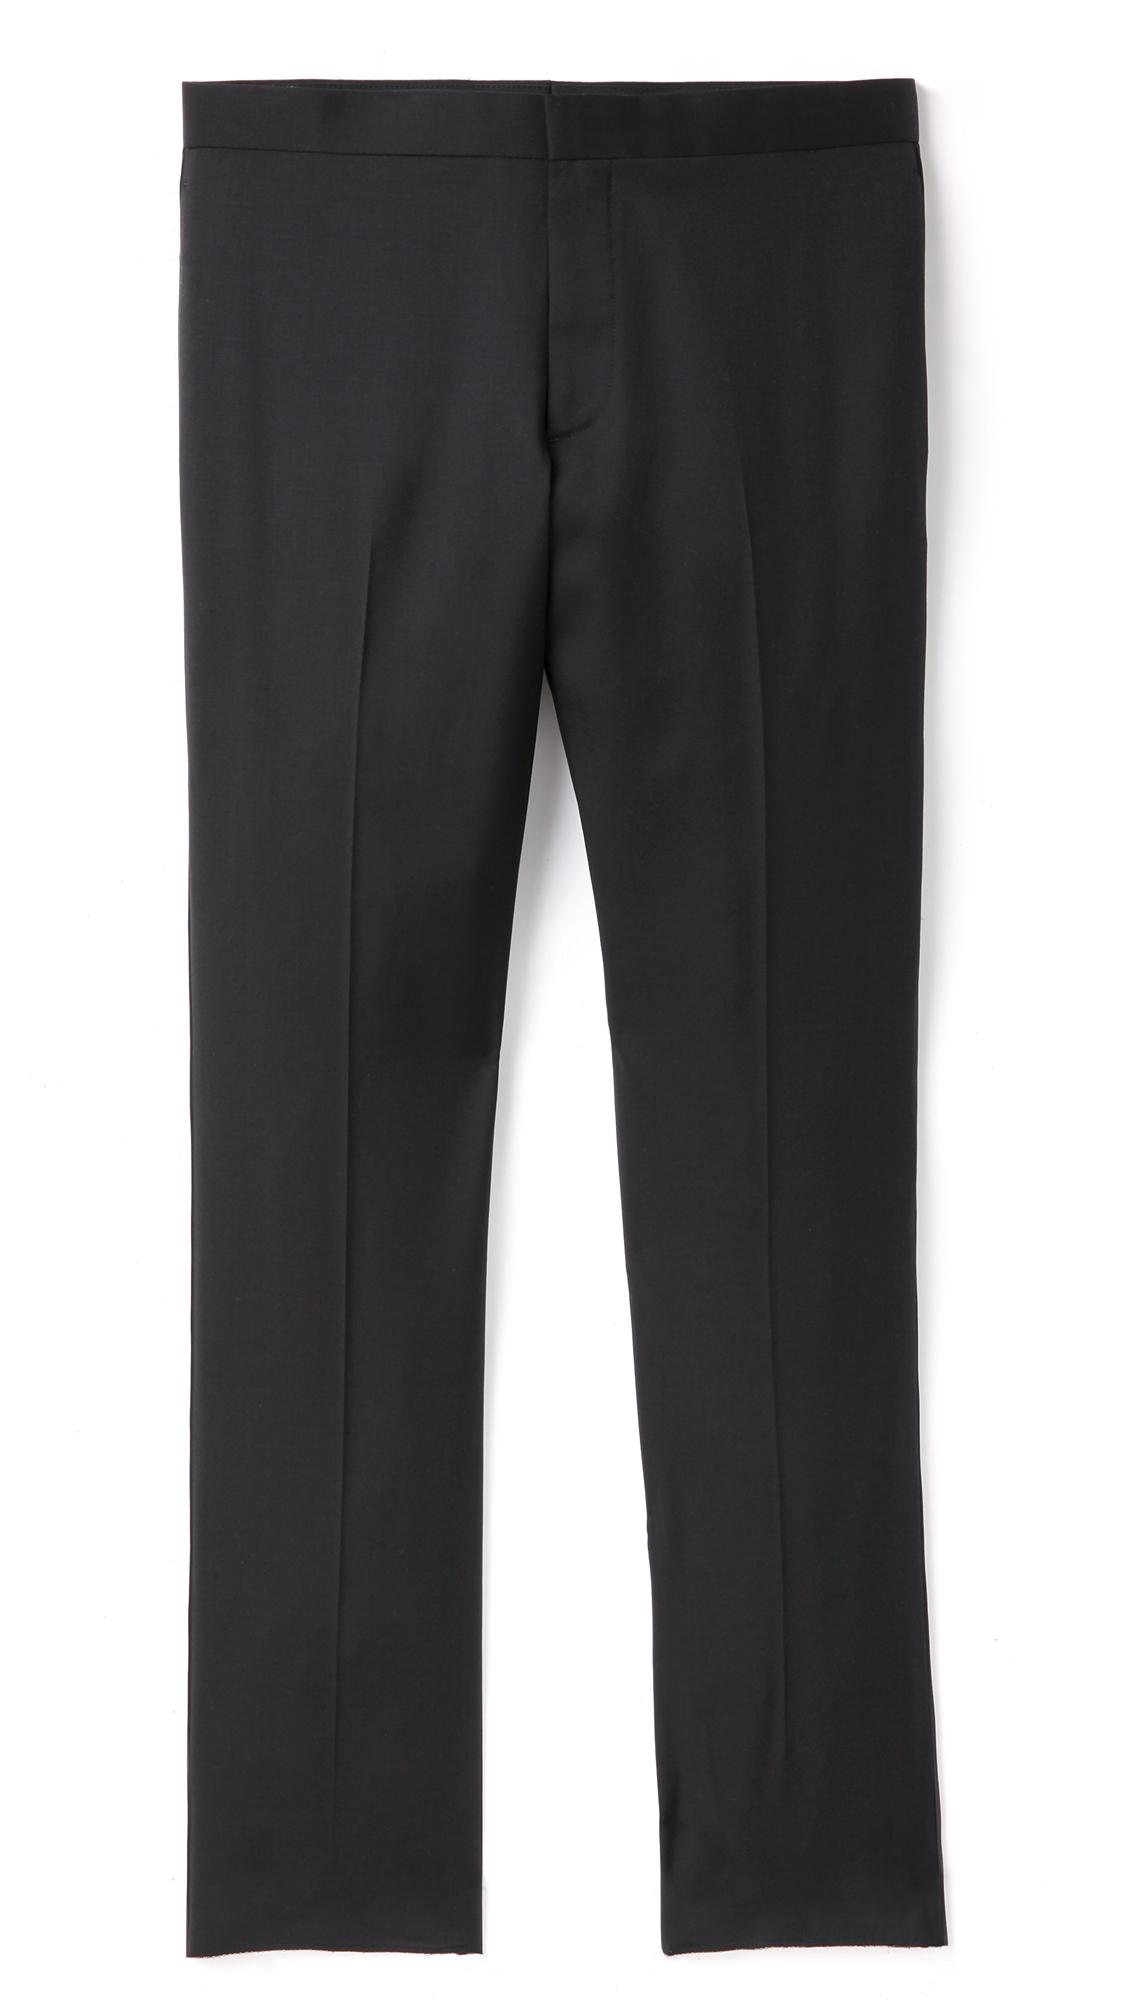 Theory Marlo Tuxedo Pants In Black For Men Lyst